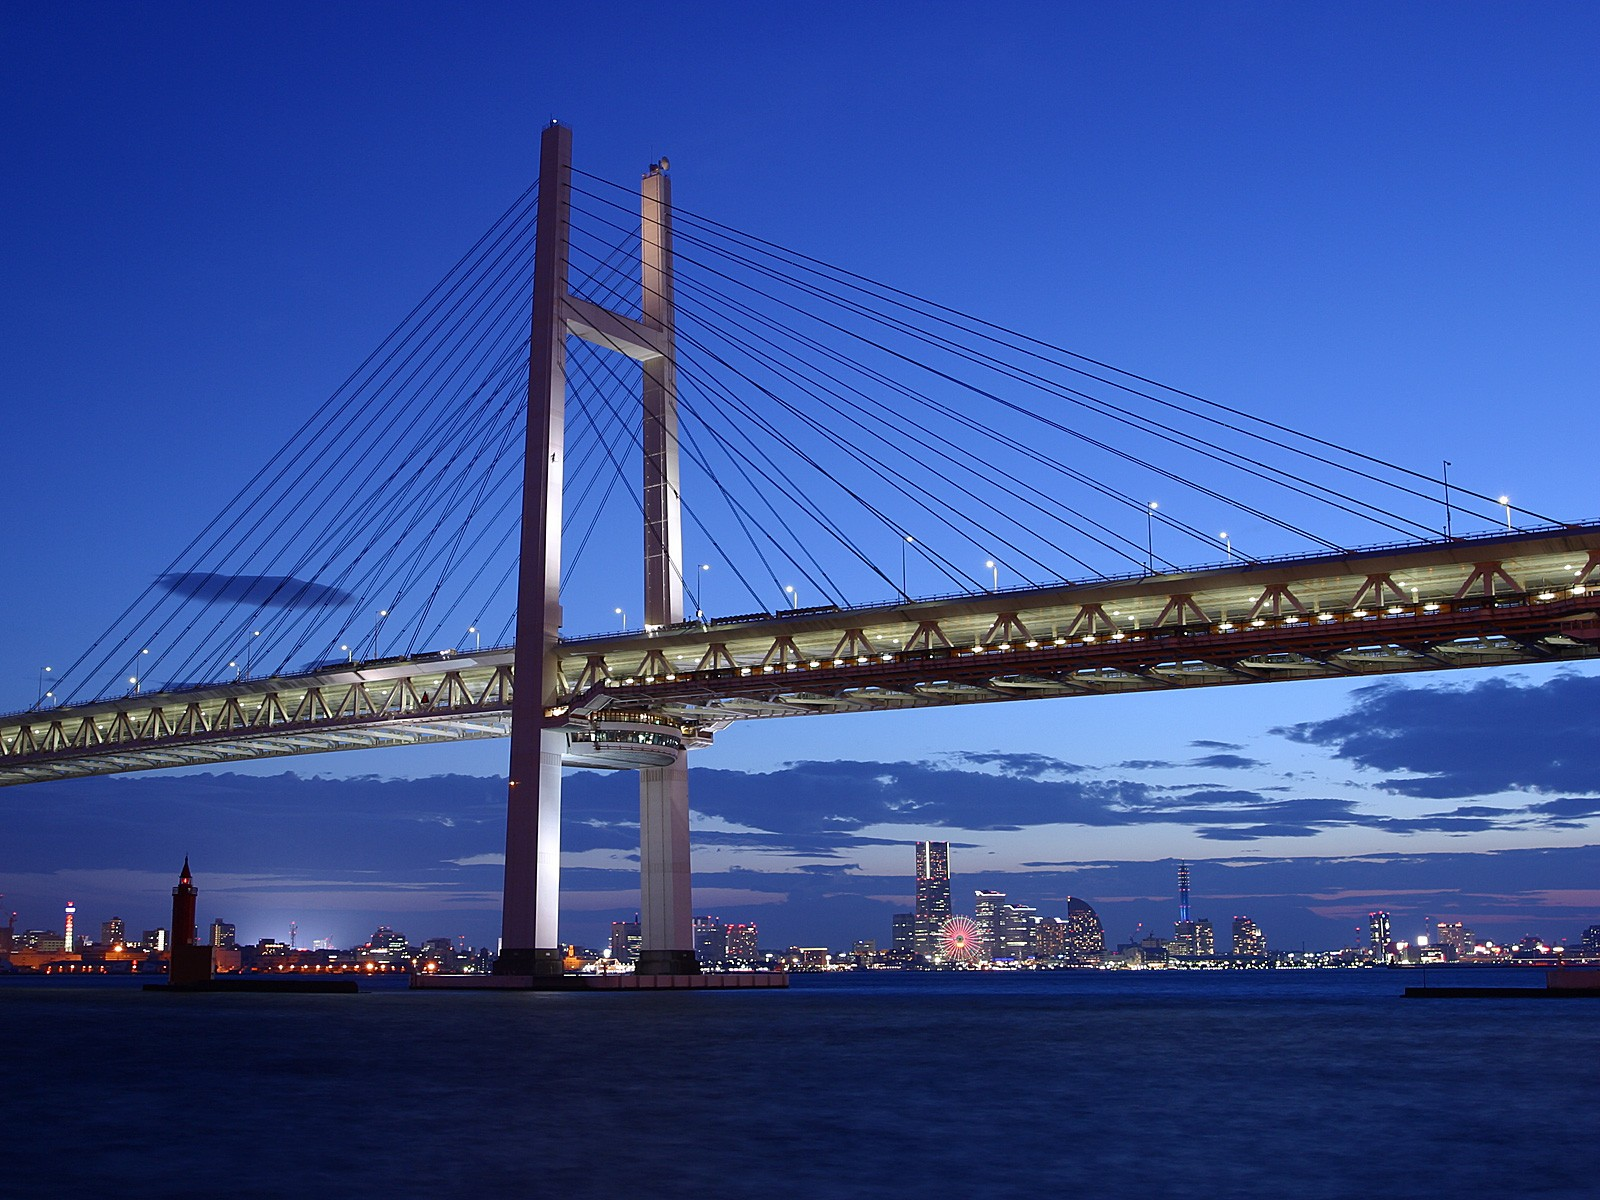 ws_blue_bridge_1600x1200